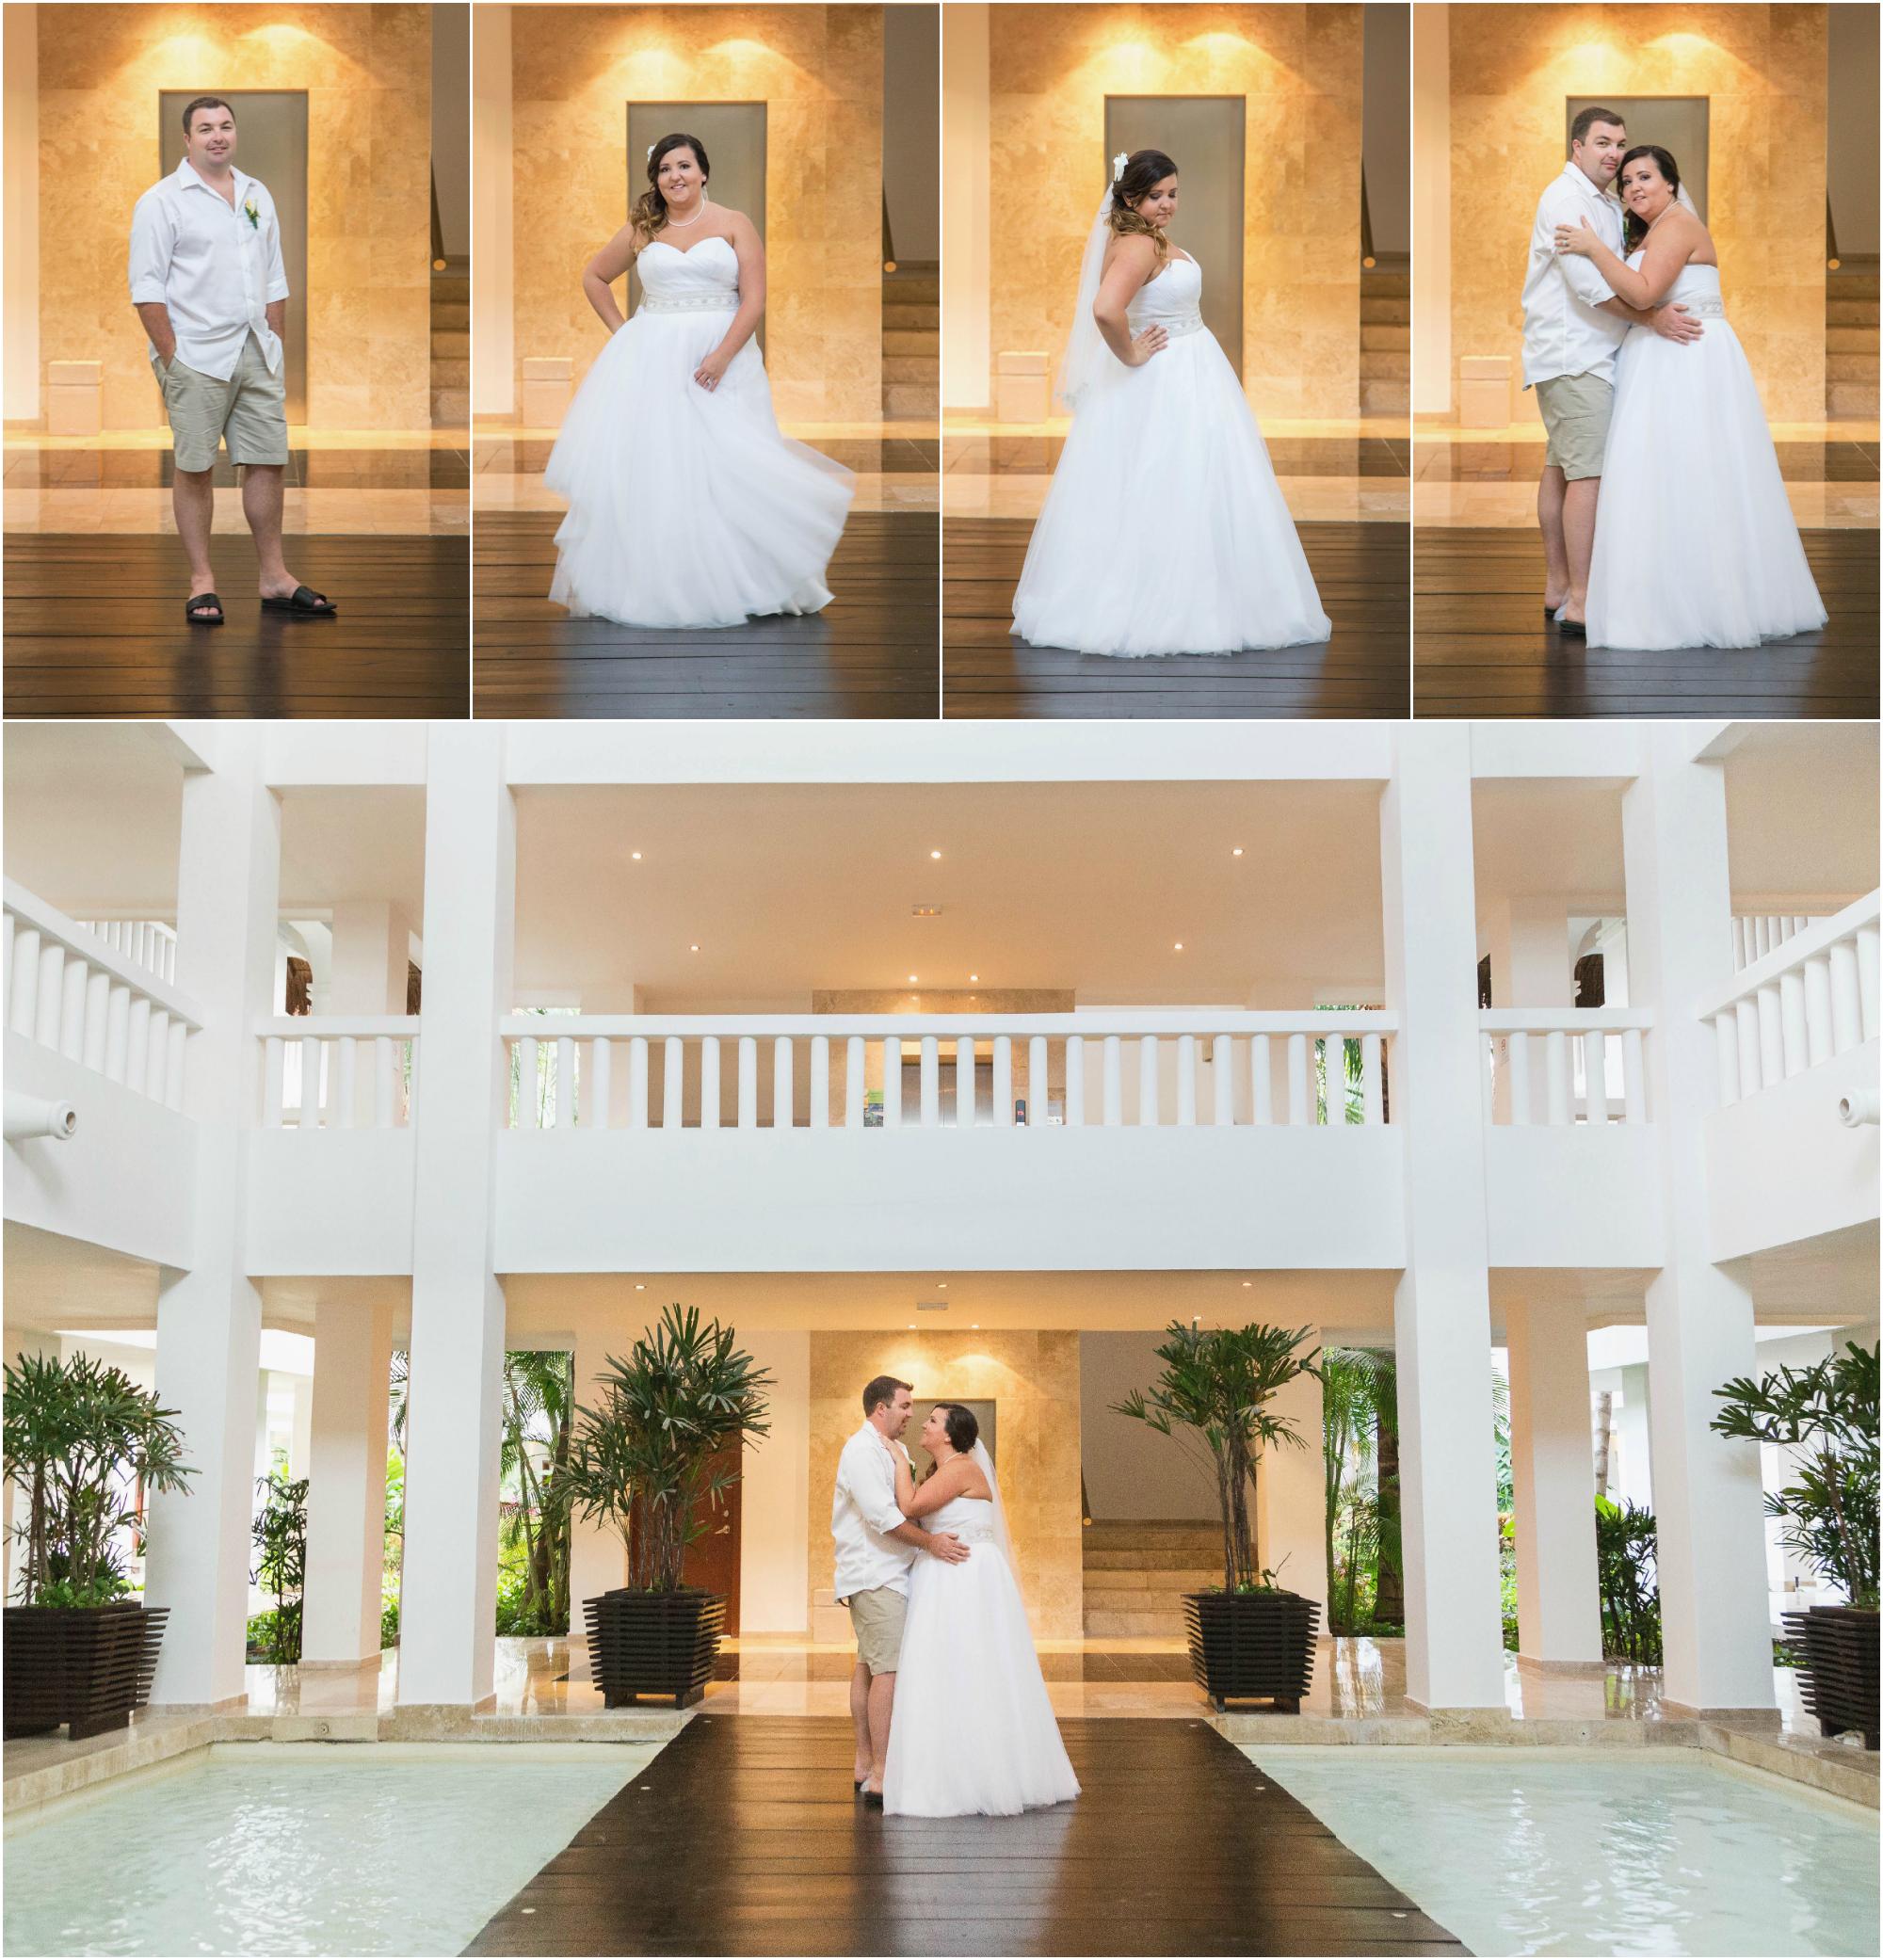 cancun_wedding29.png